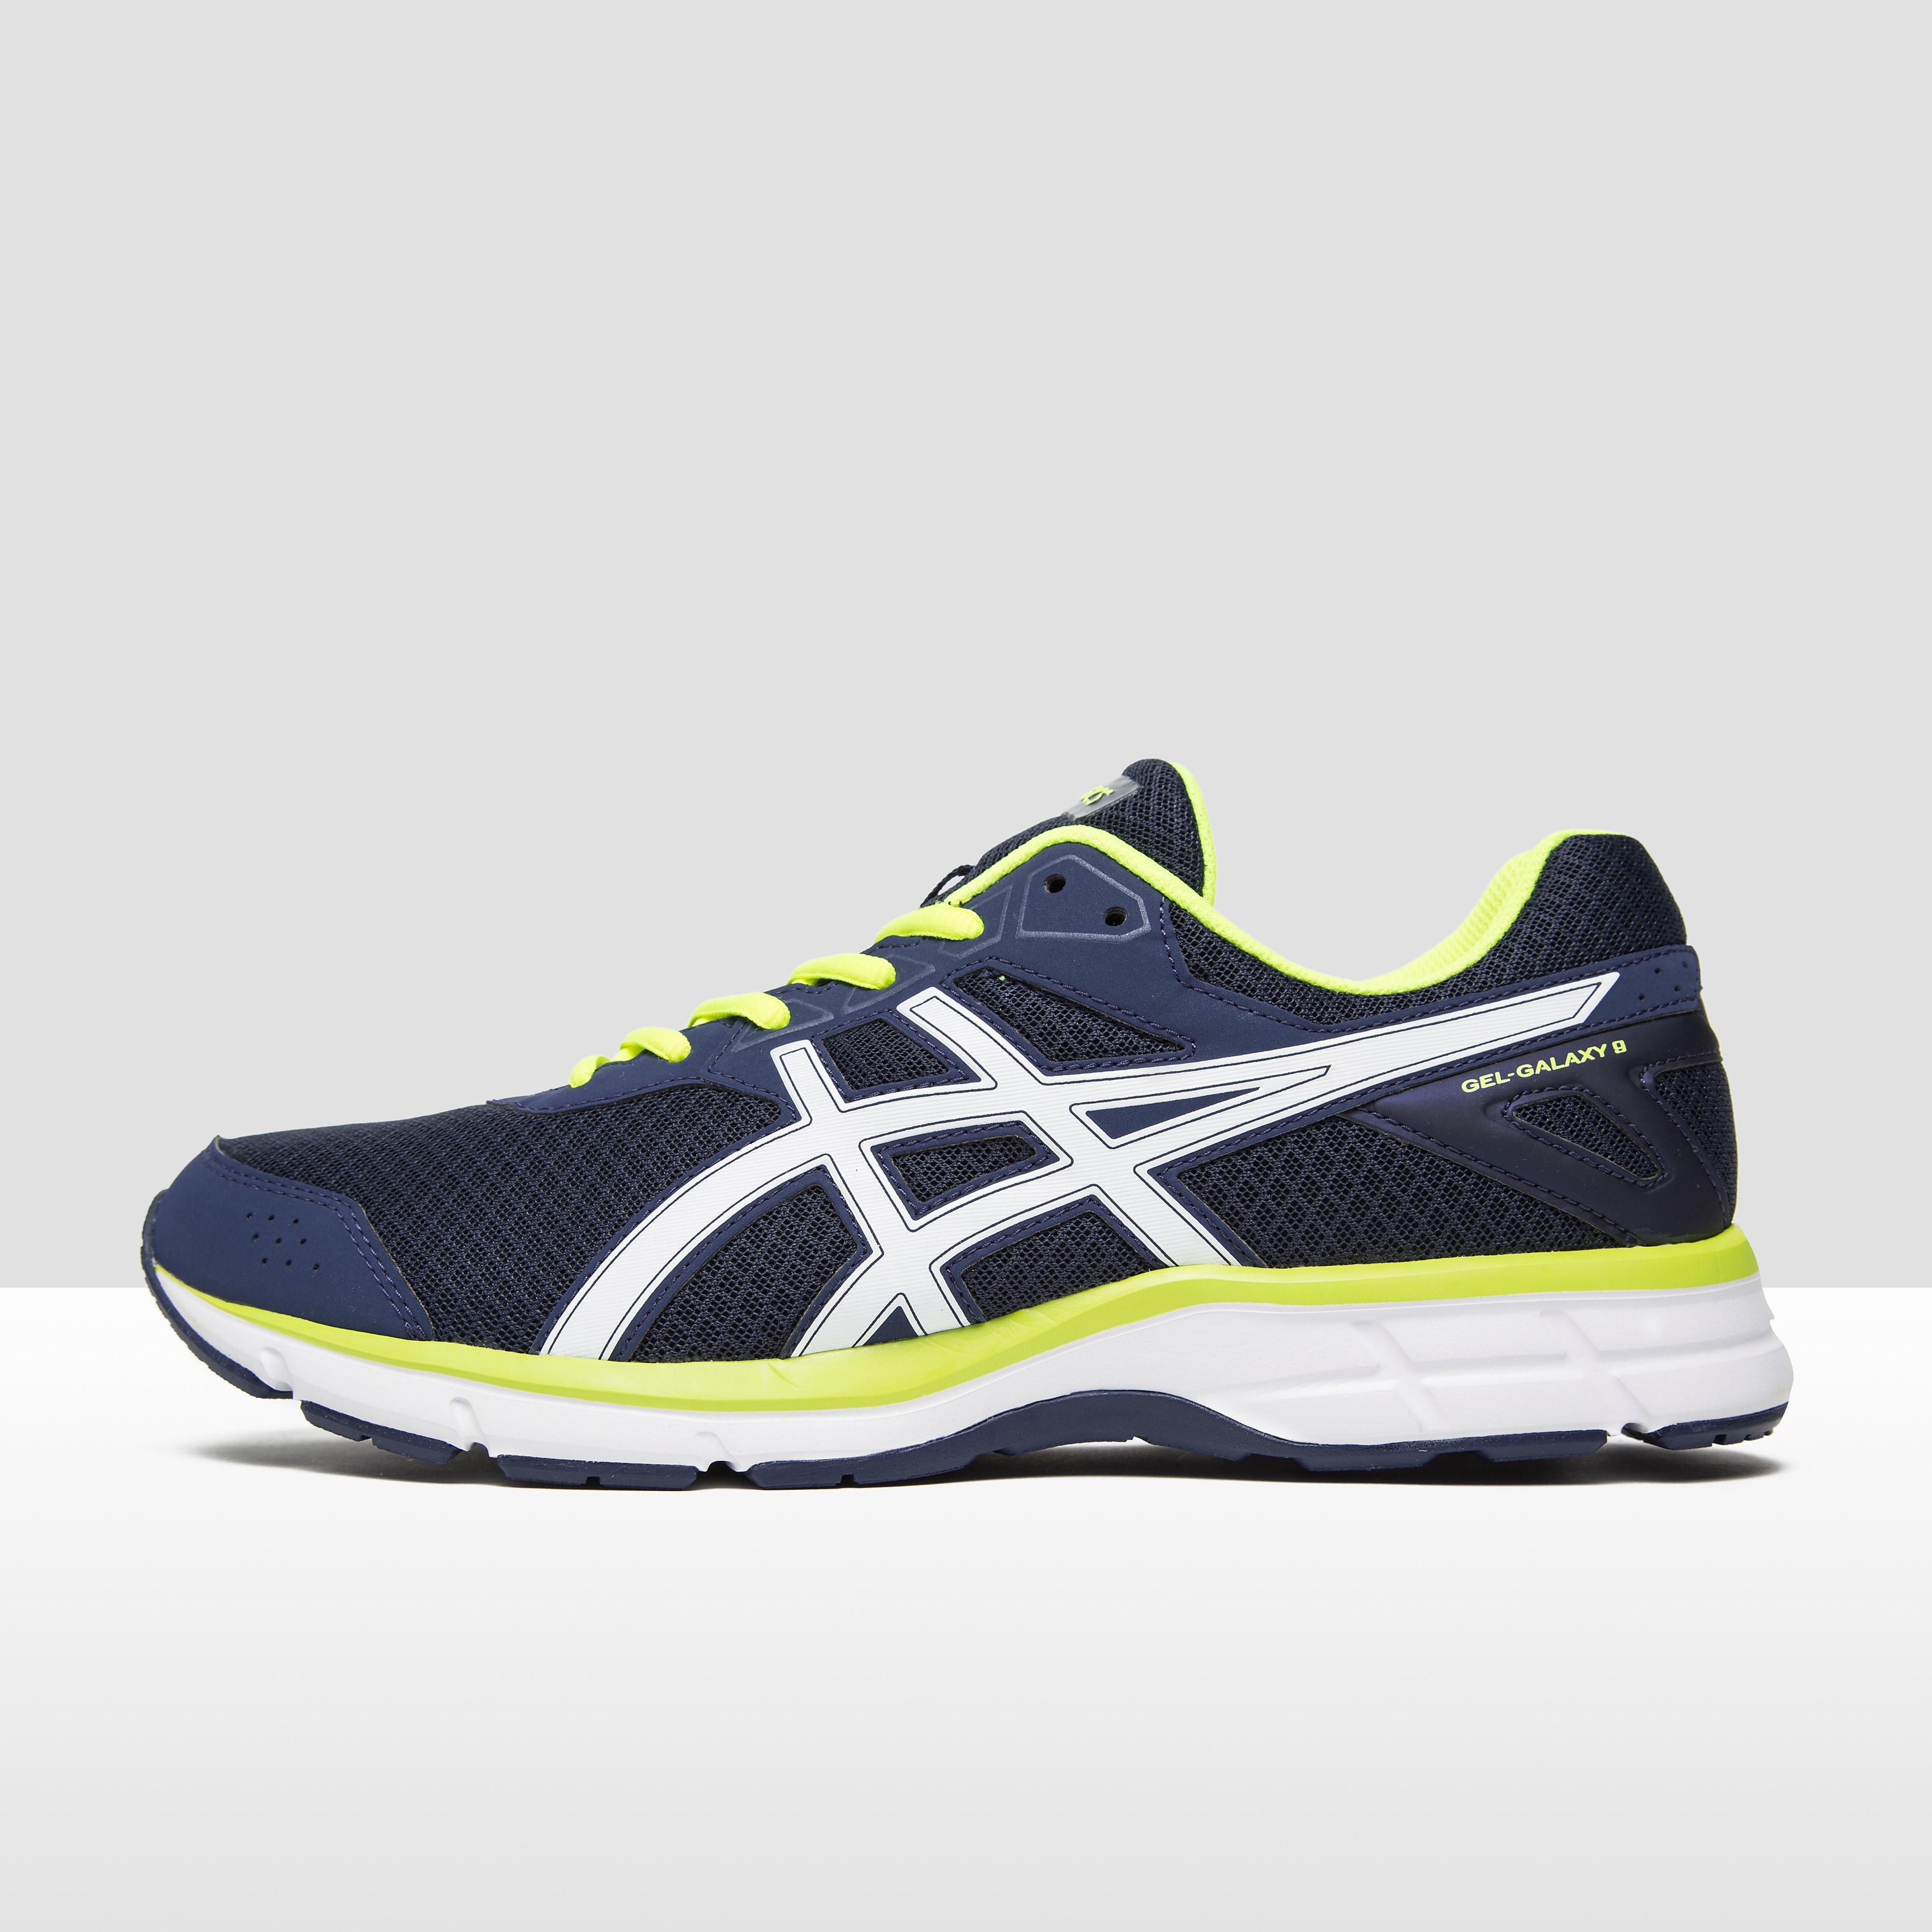 Asics Gel-Galaxy 9 Men's Running Shoes